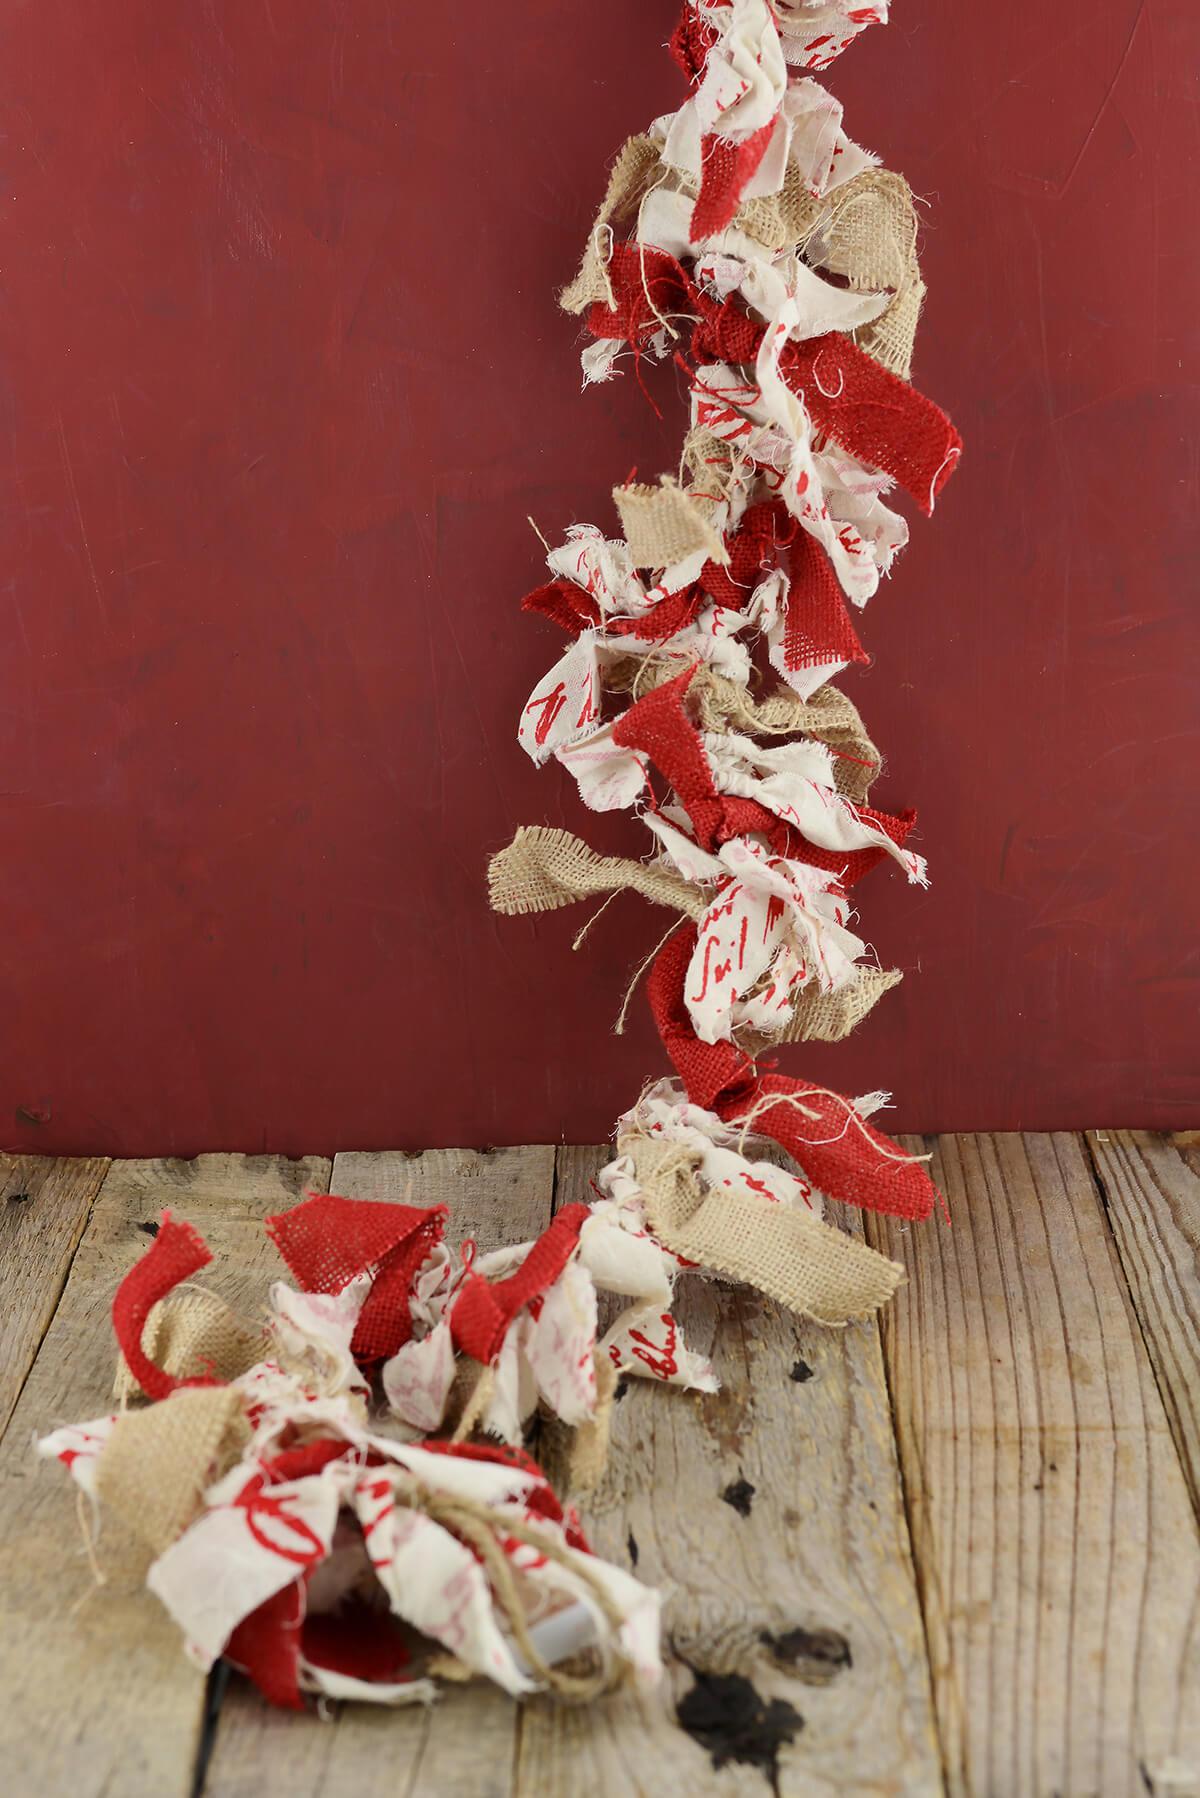 Burlap rag tie garland 4ft for Save on crafts burlap